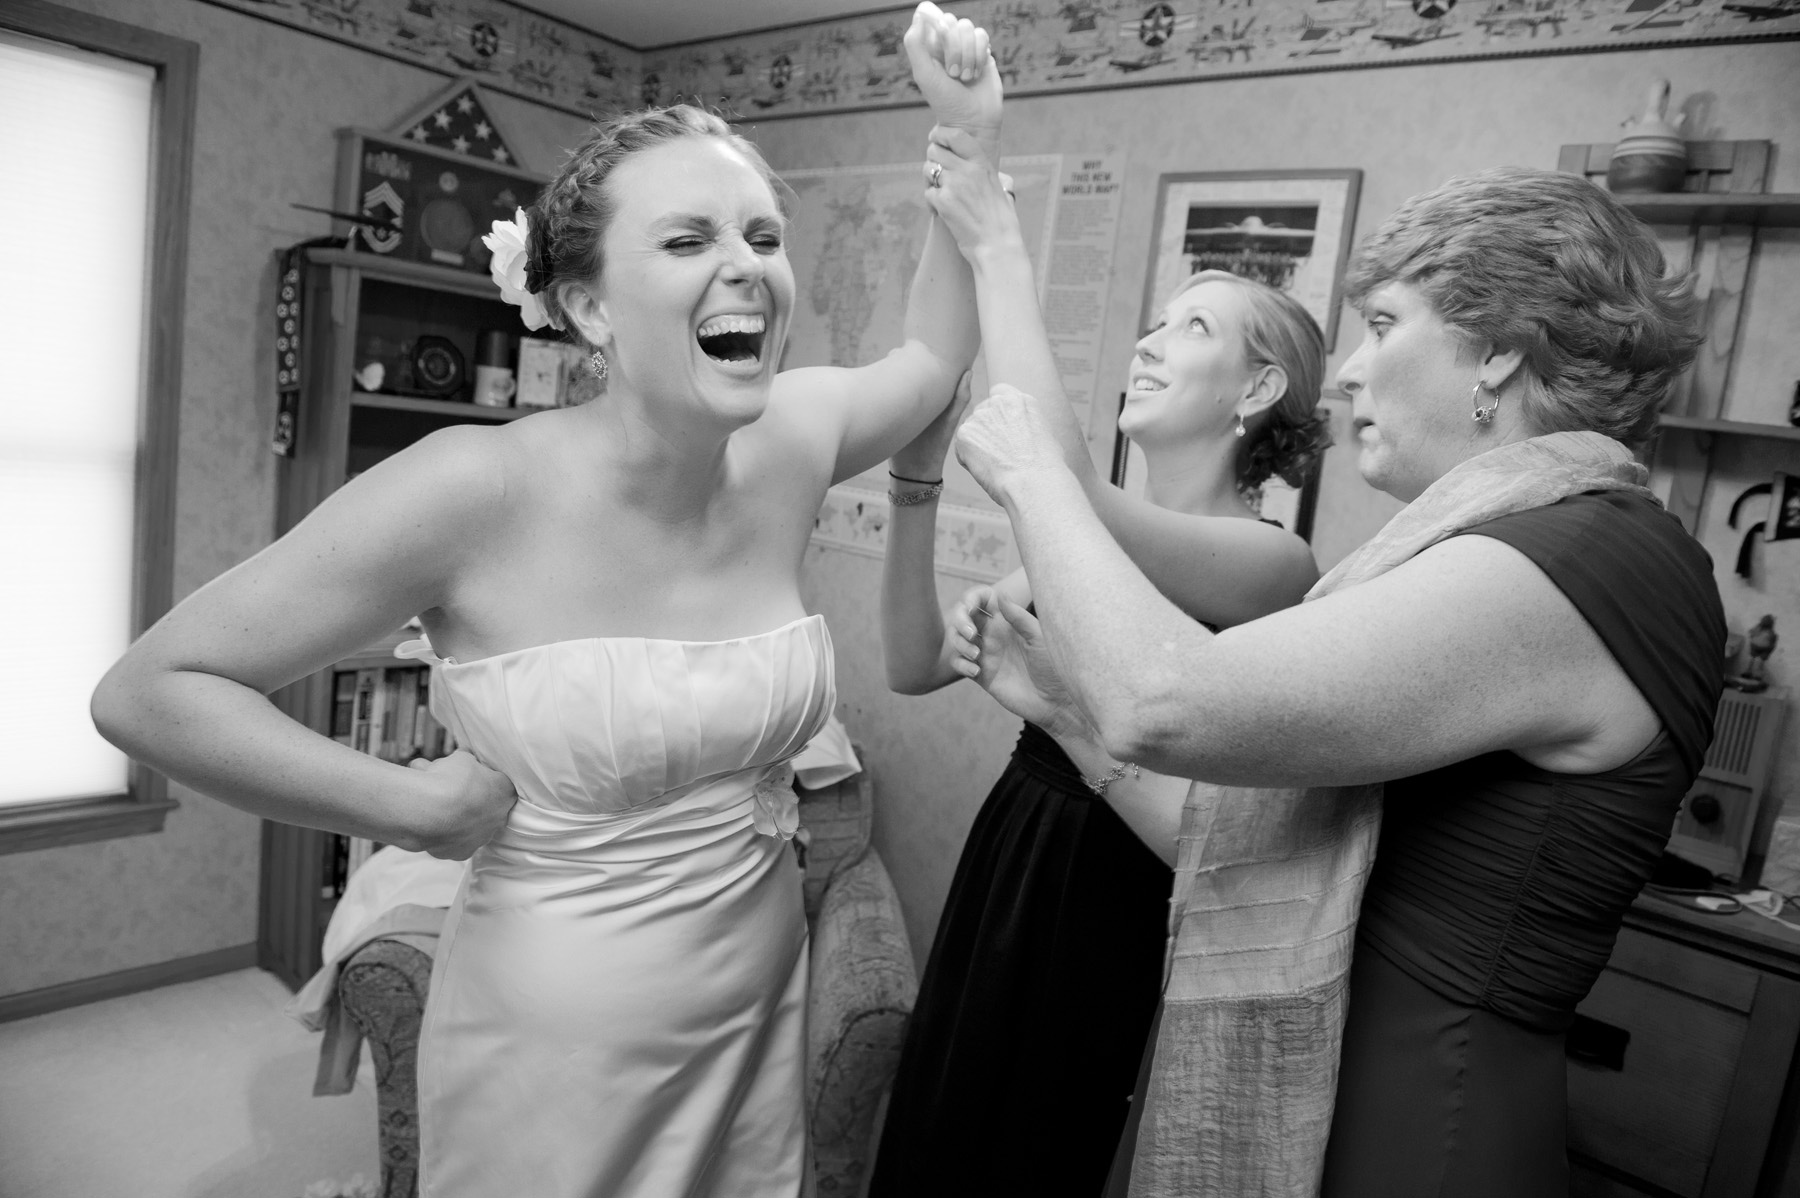 minneapolis-wedding-photography-mark-kegans-335.jpg